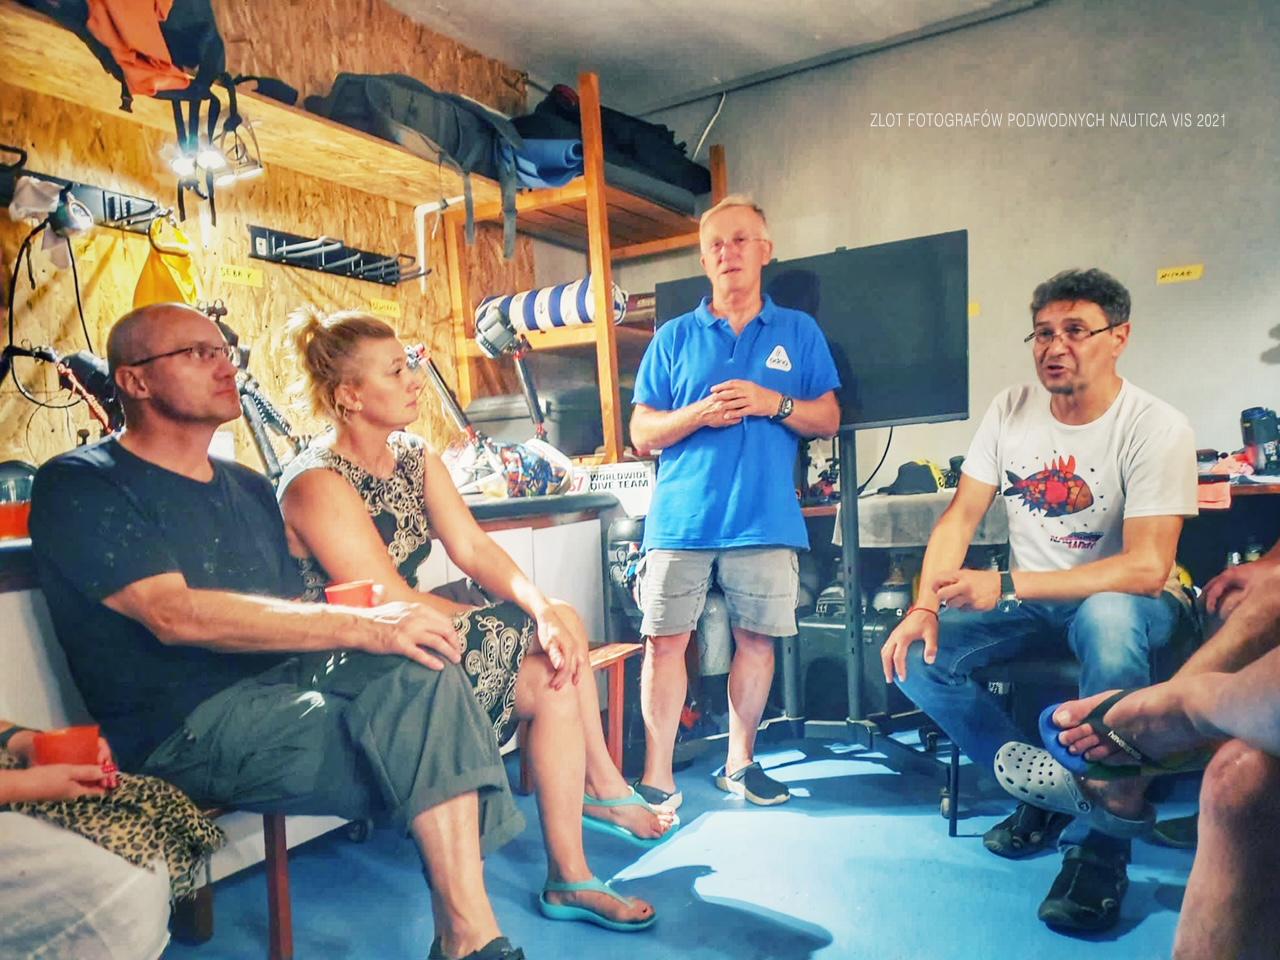 Zlot Fotografów Podwodnych Vis 2021 -